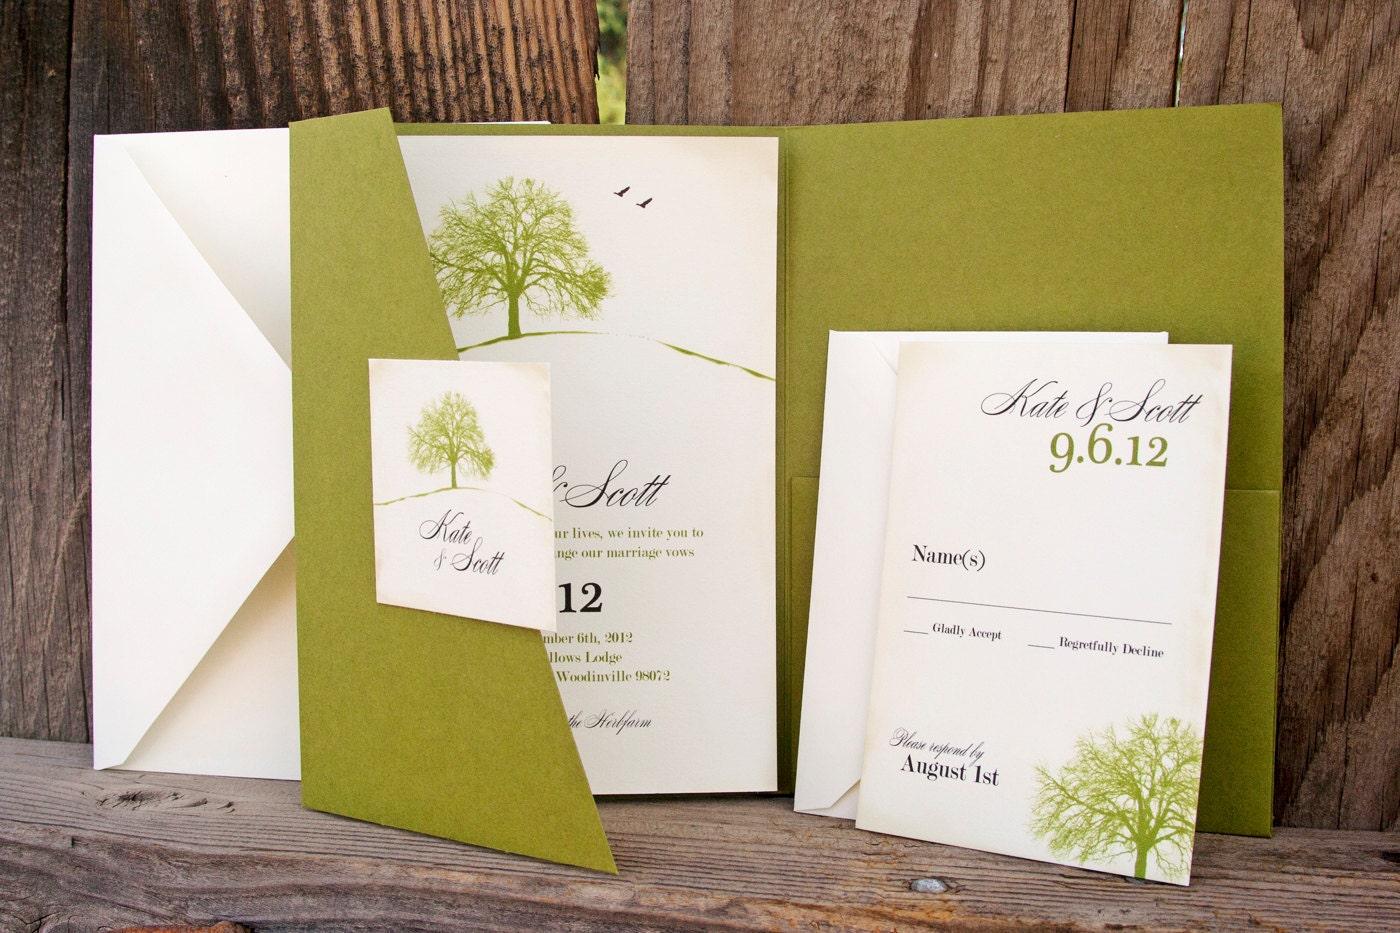 Environmentally Friendly Wedding Invitations: Under The Big Tree Kiwi Nature Loving Wedding By Mavora On